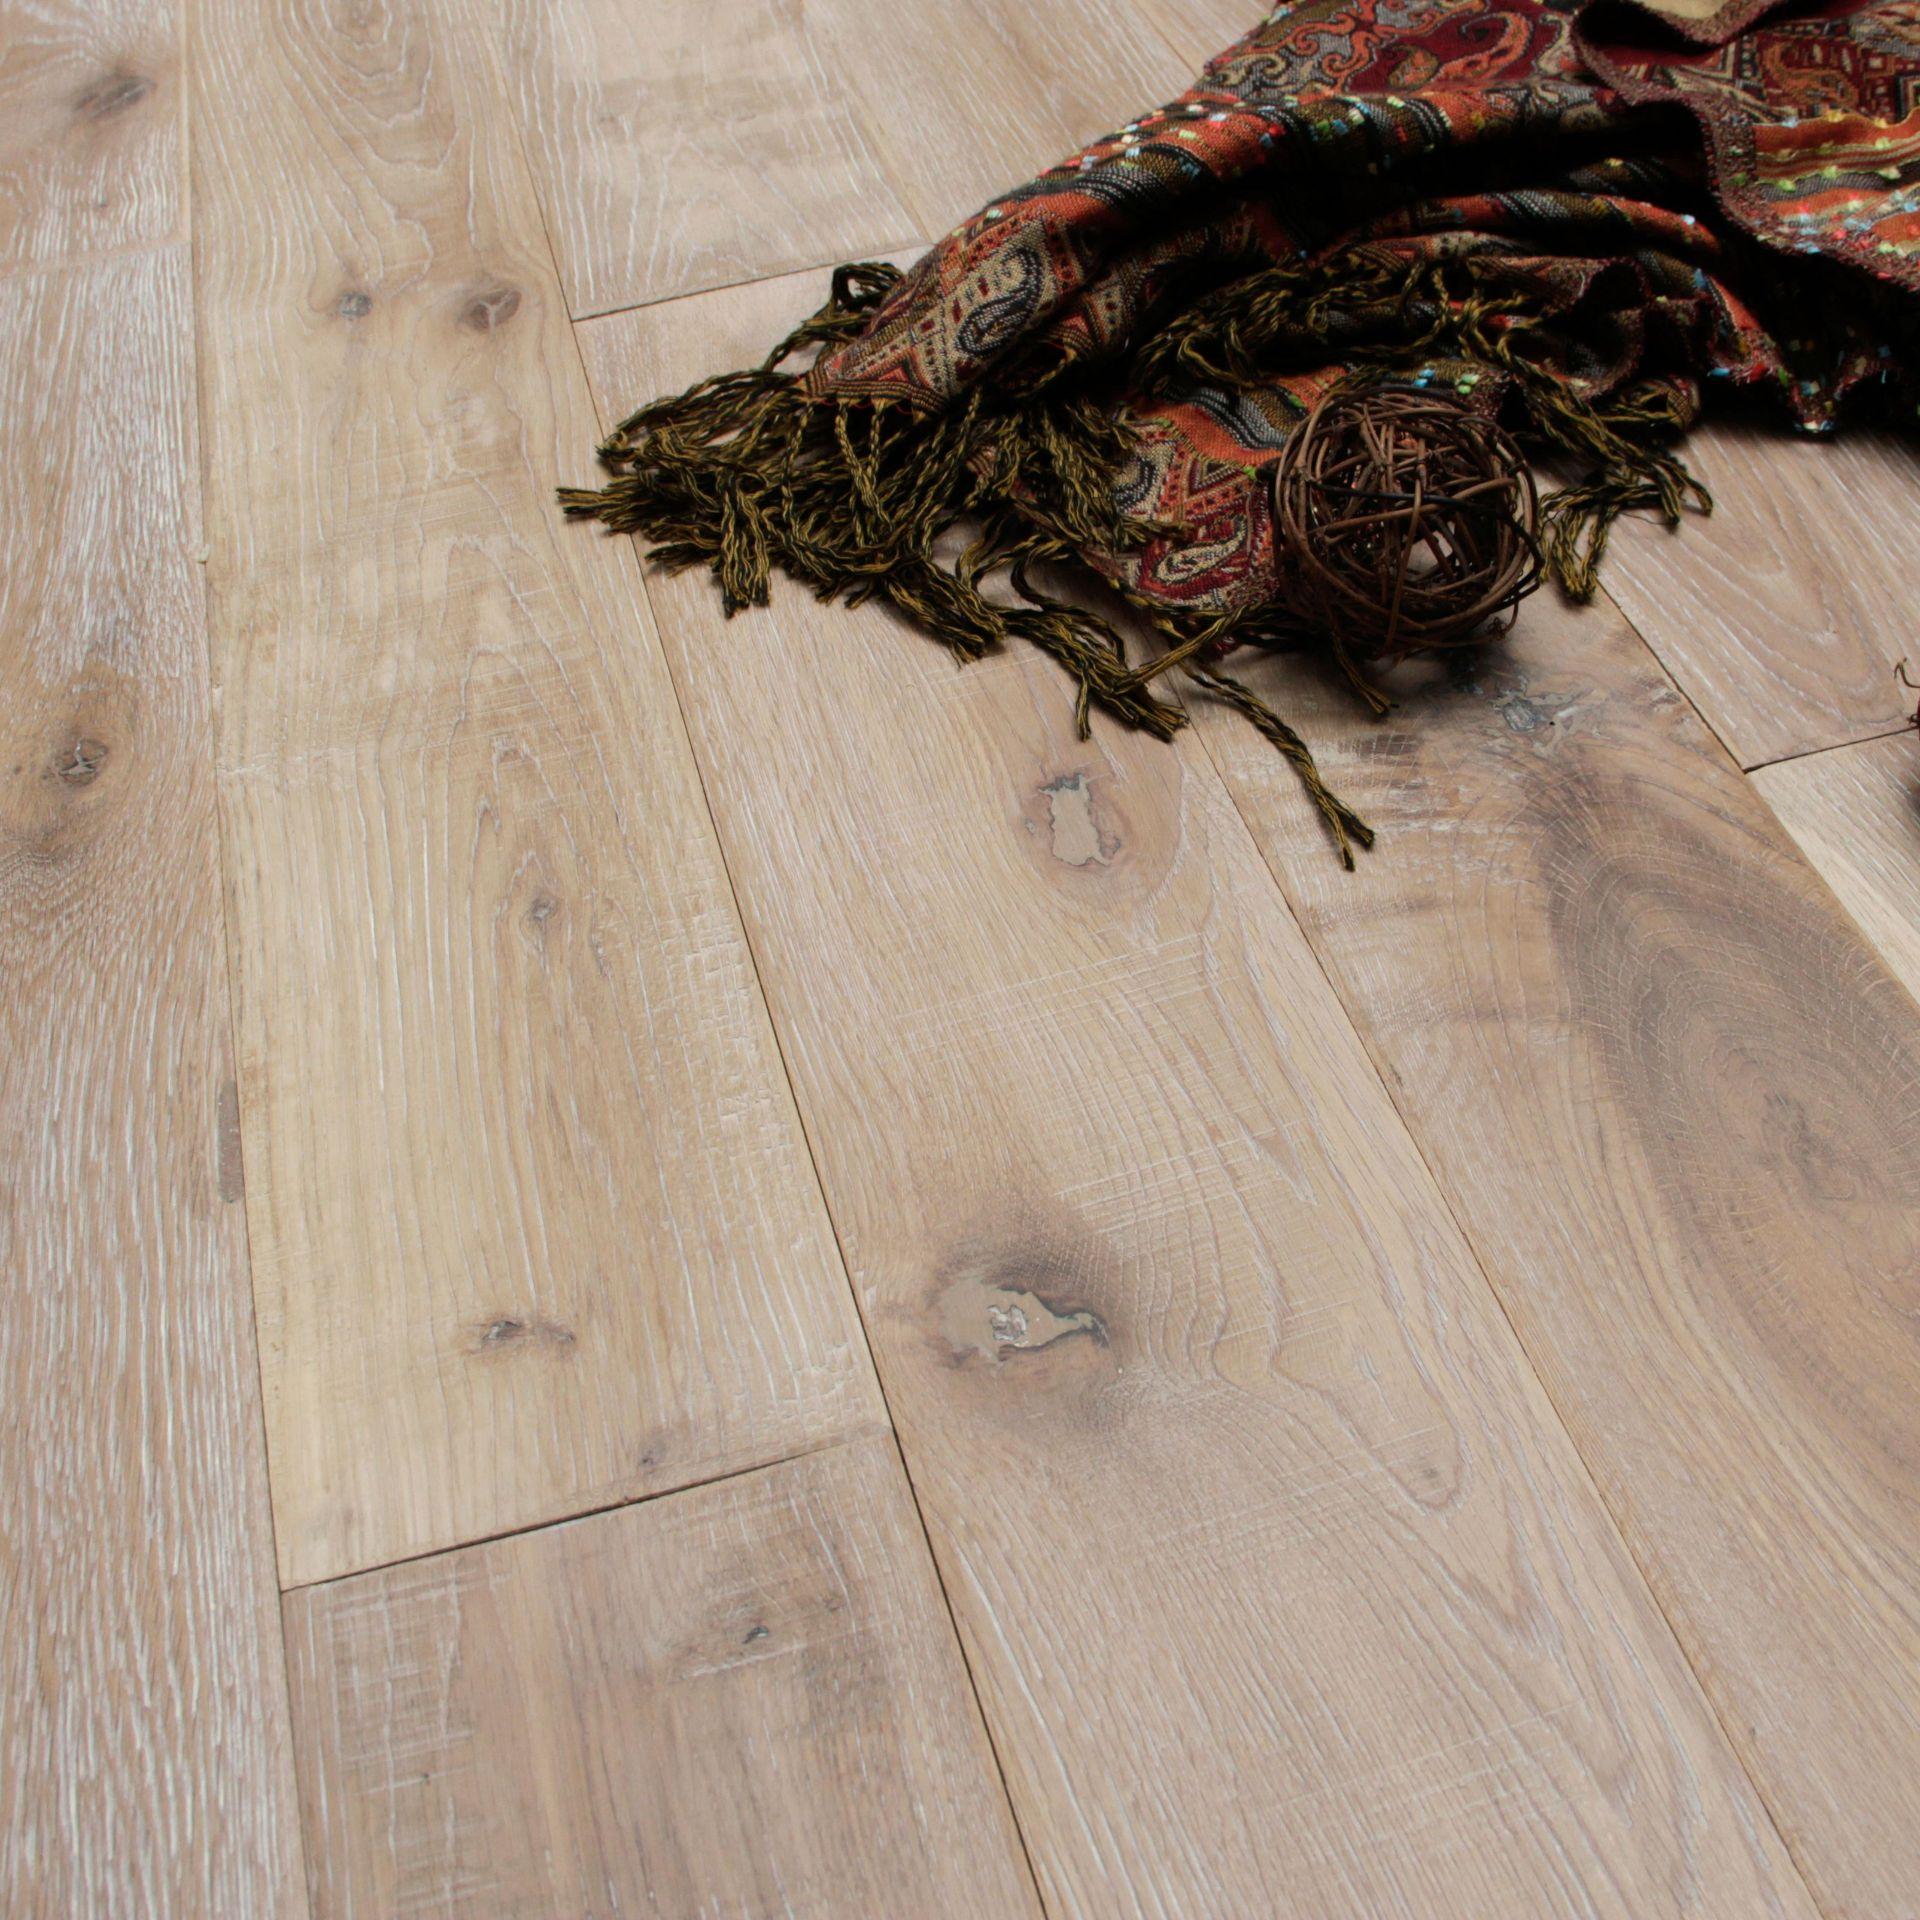 NEW 11.84M2 Soren Vintage Finish Solid Oak Flooring Antique Ash. 15mm thickness, 123x1200mm per